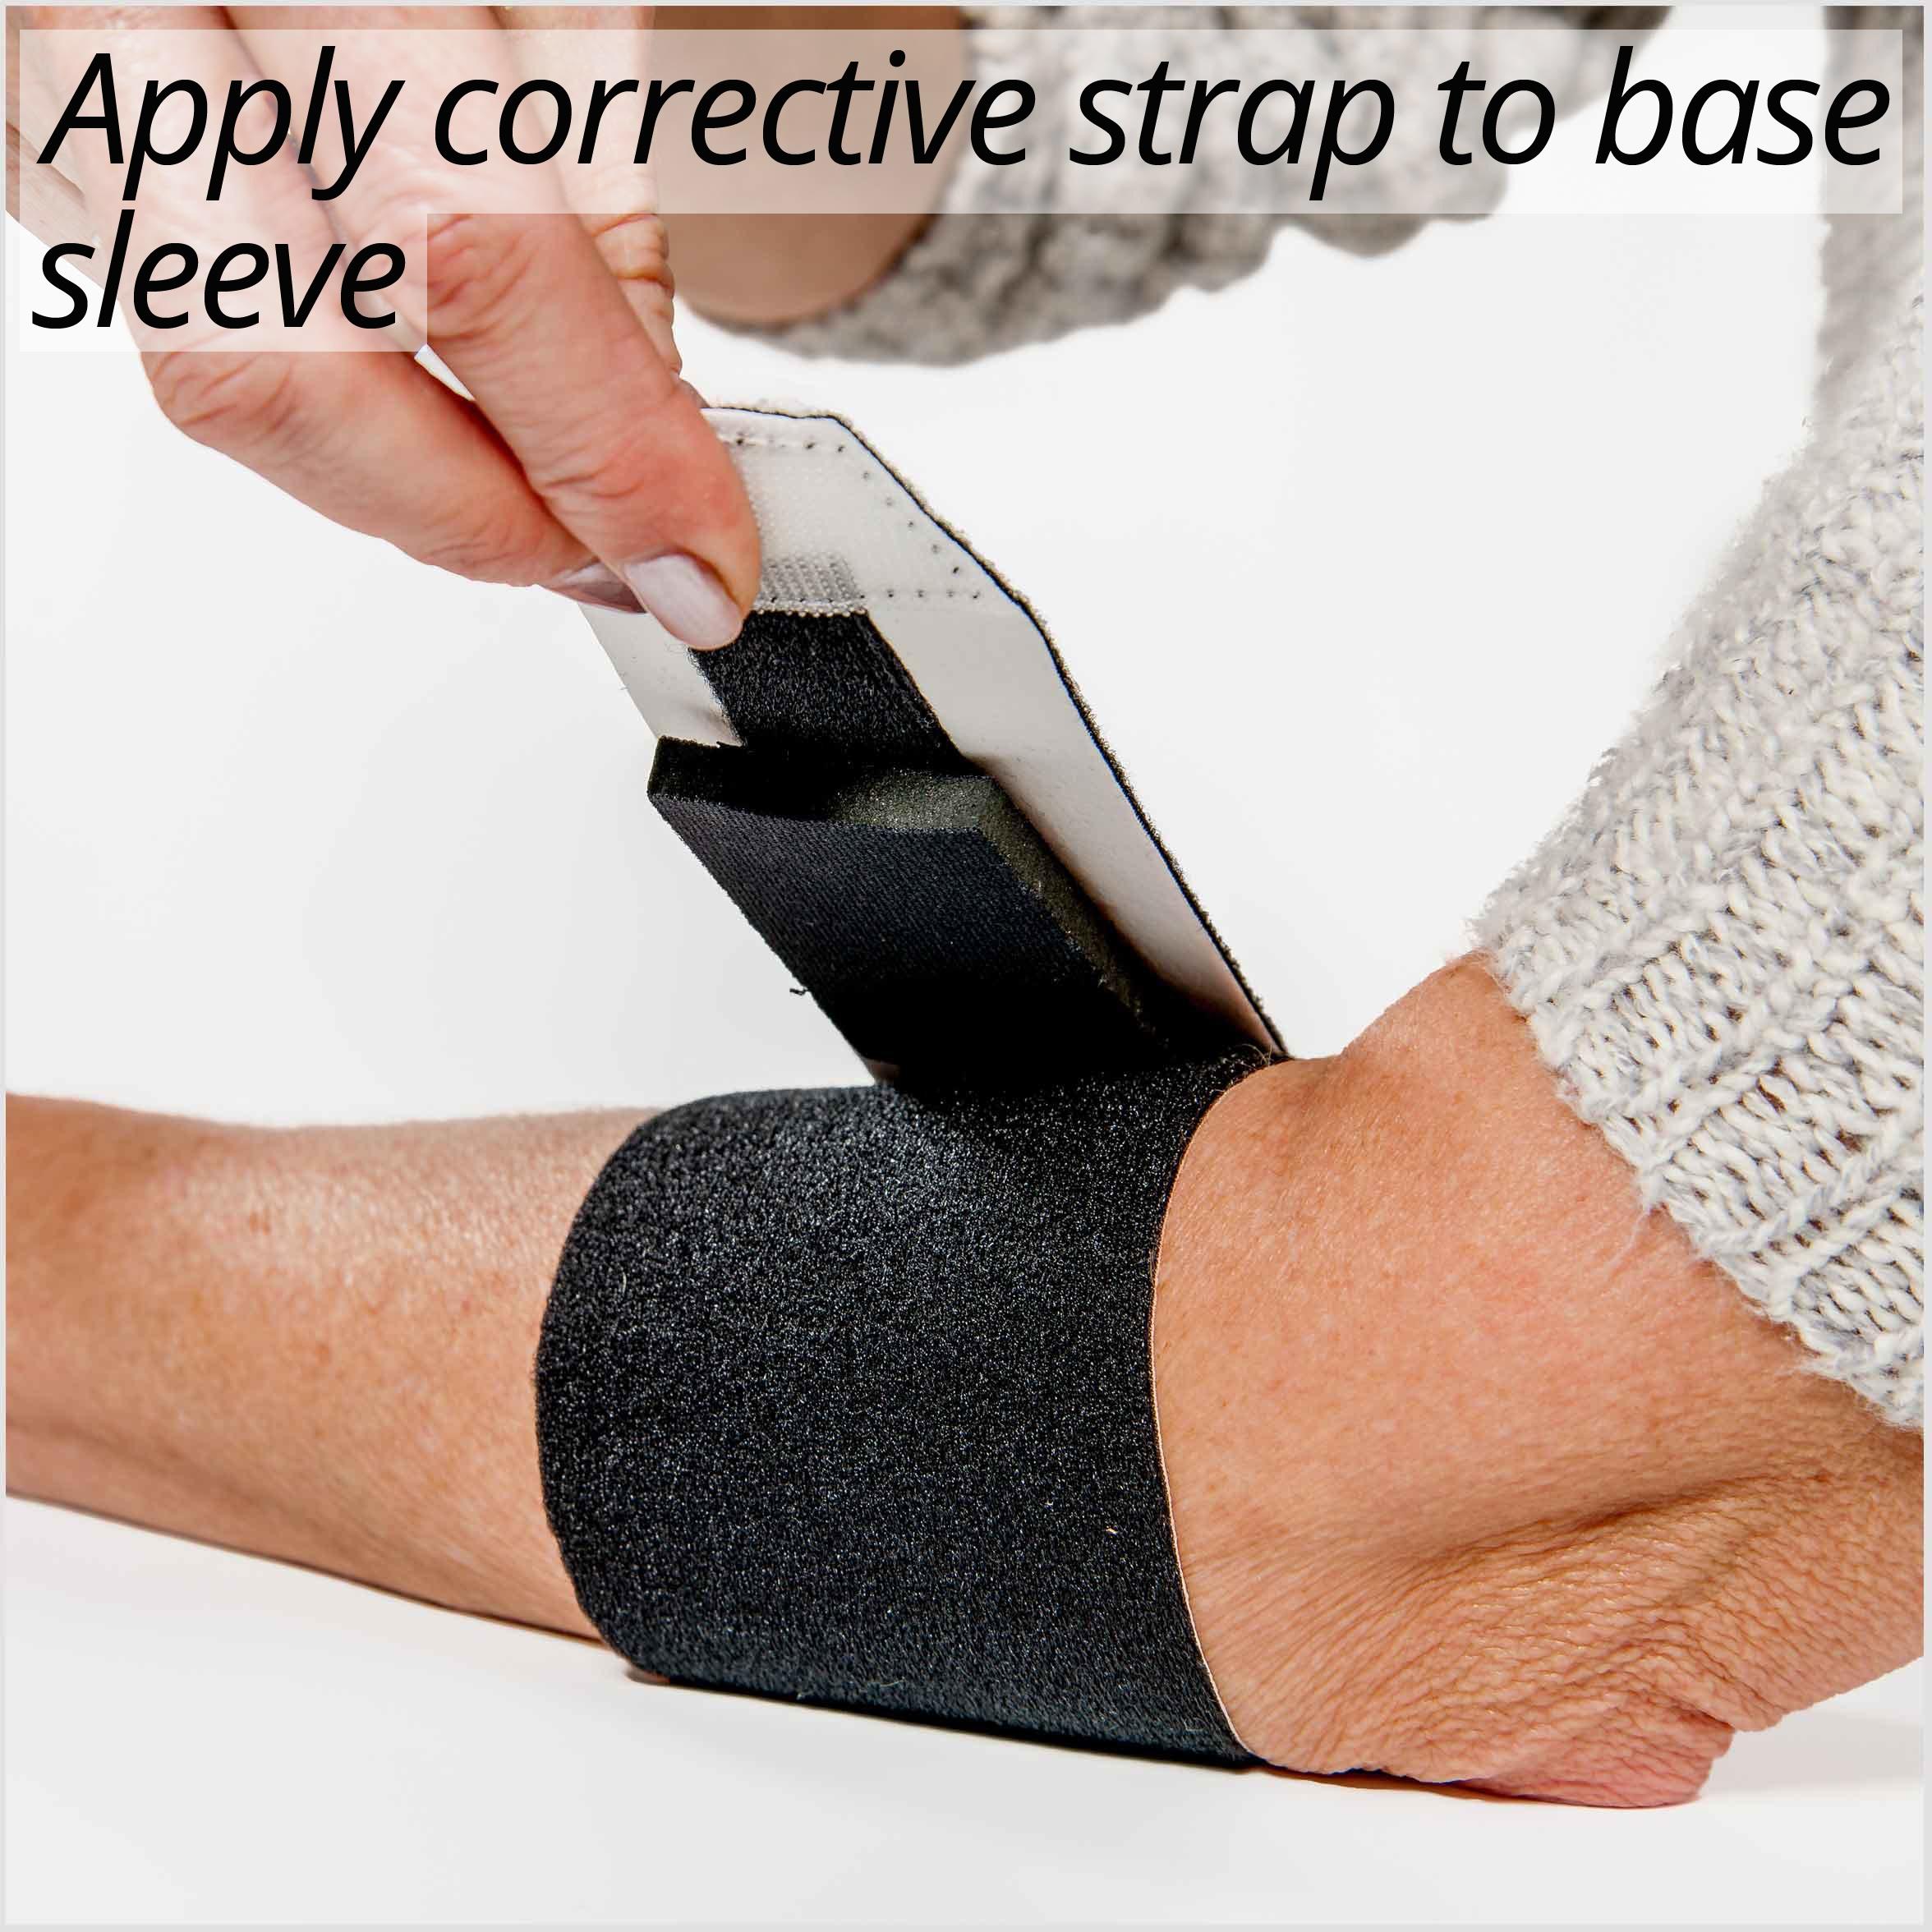 3pp Elbow POP applying corrective strap